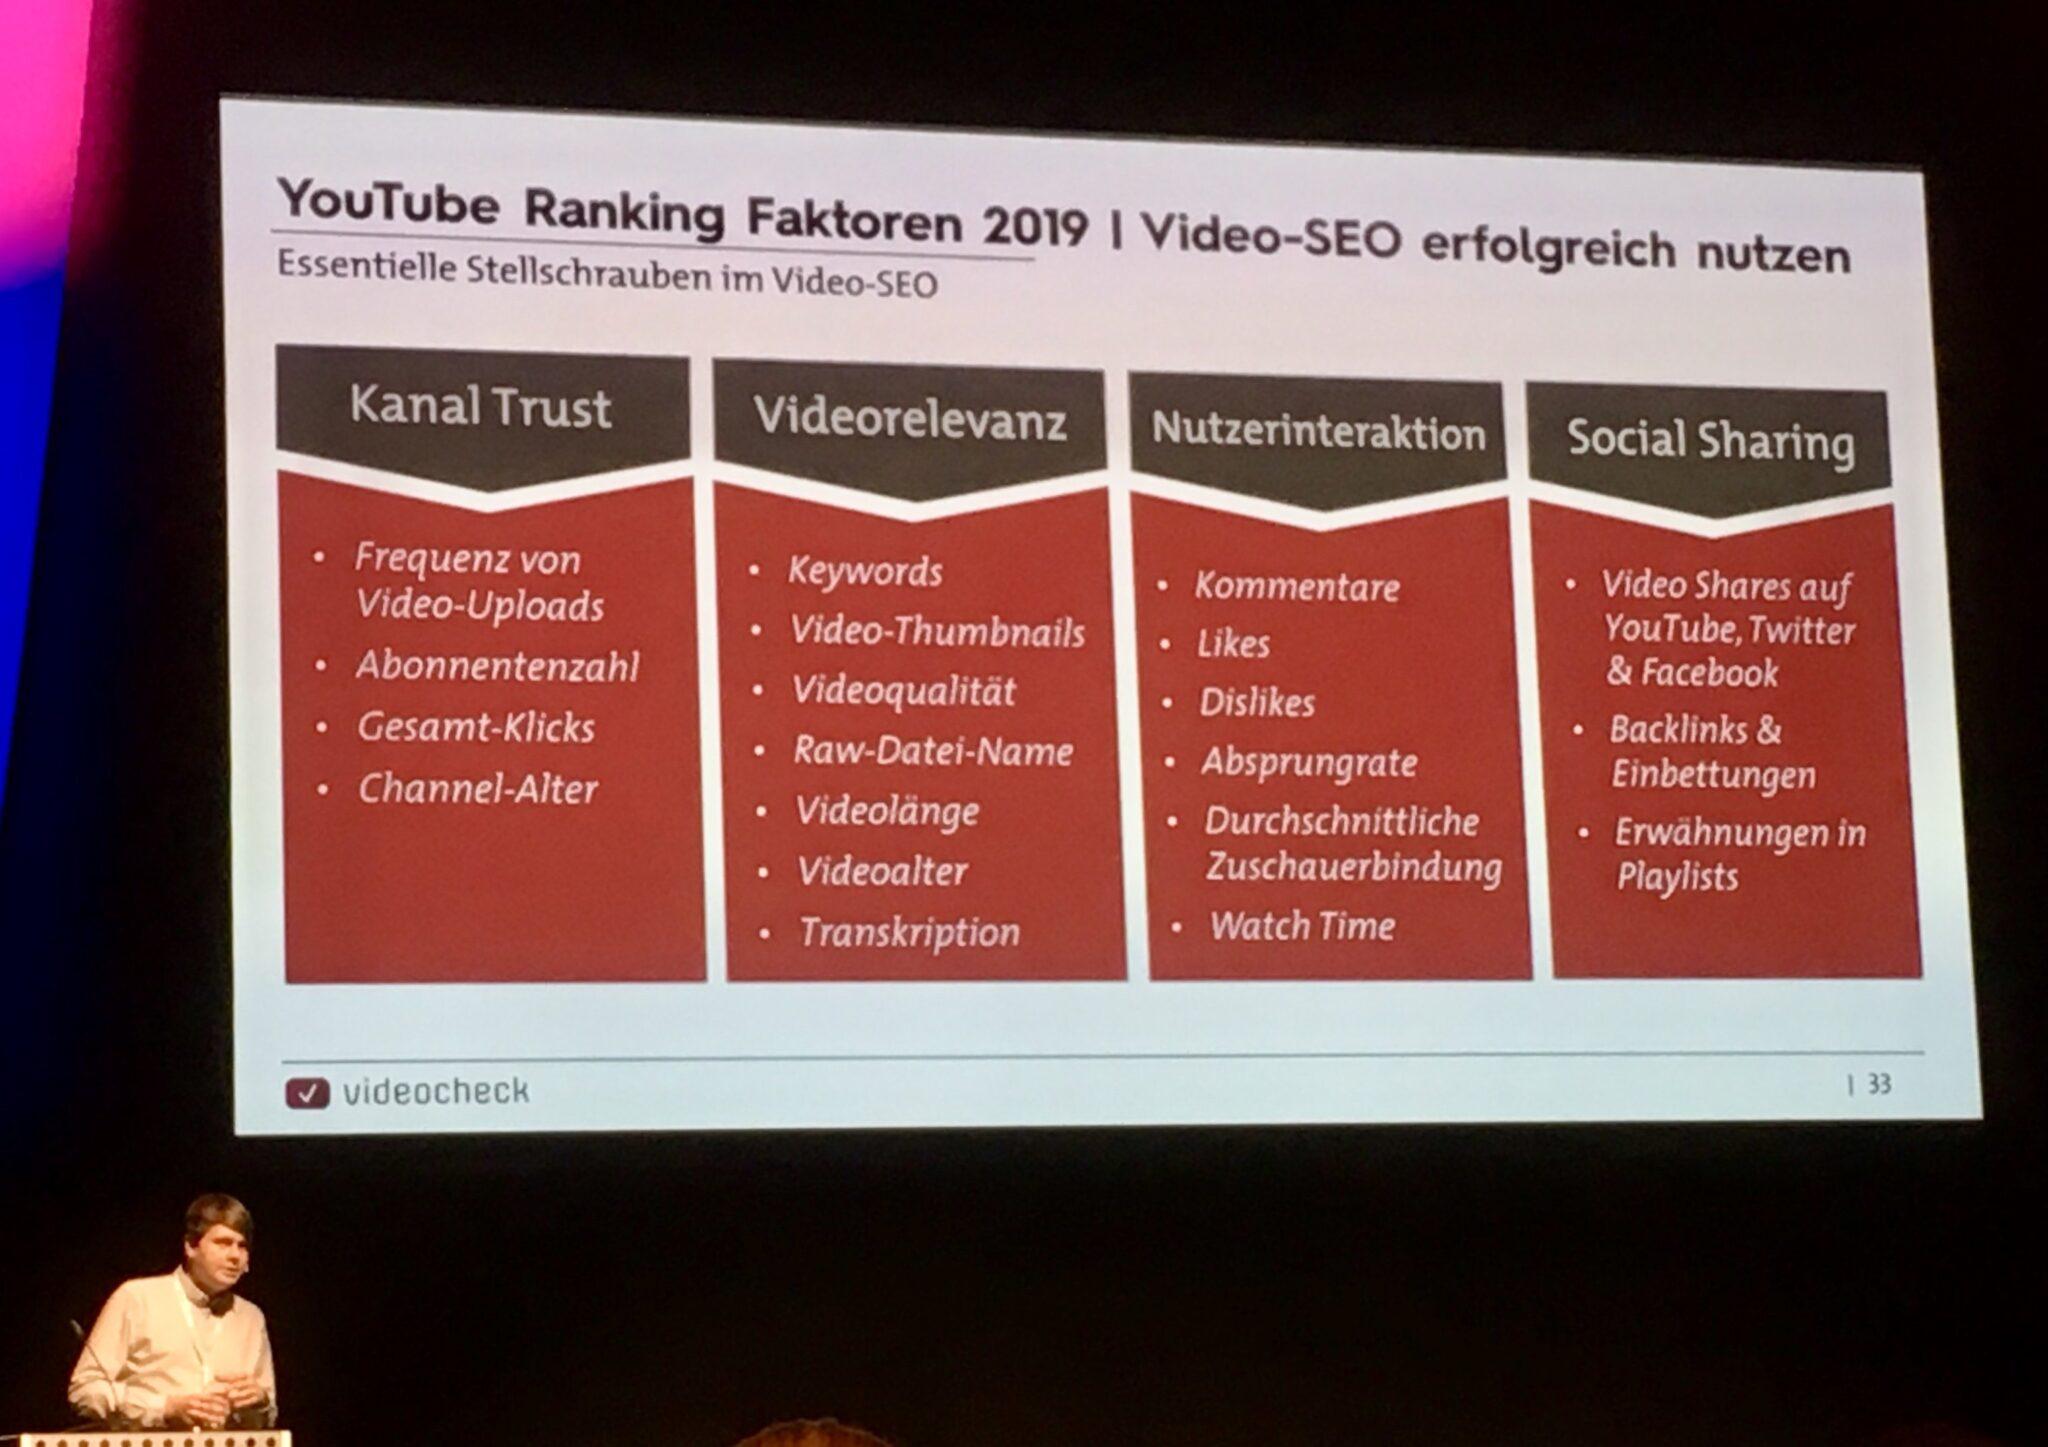 Youtube Ranking Faktoren